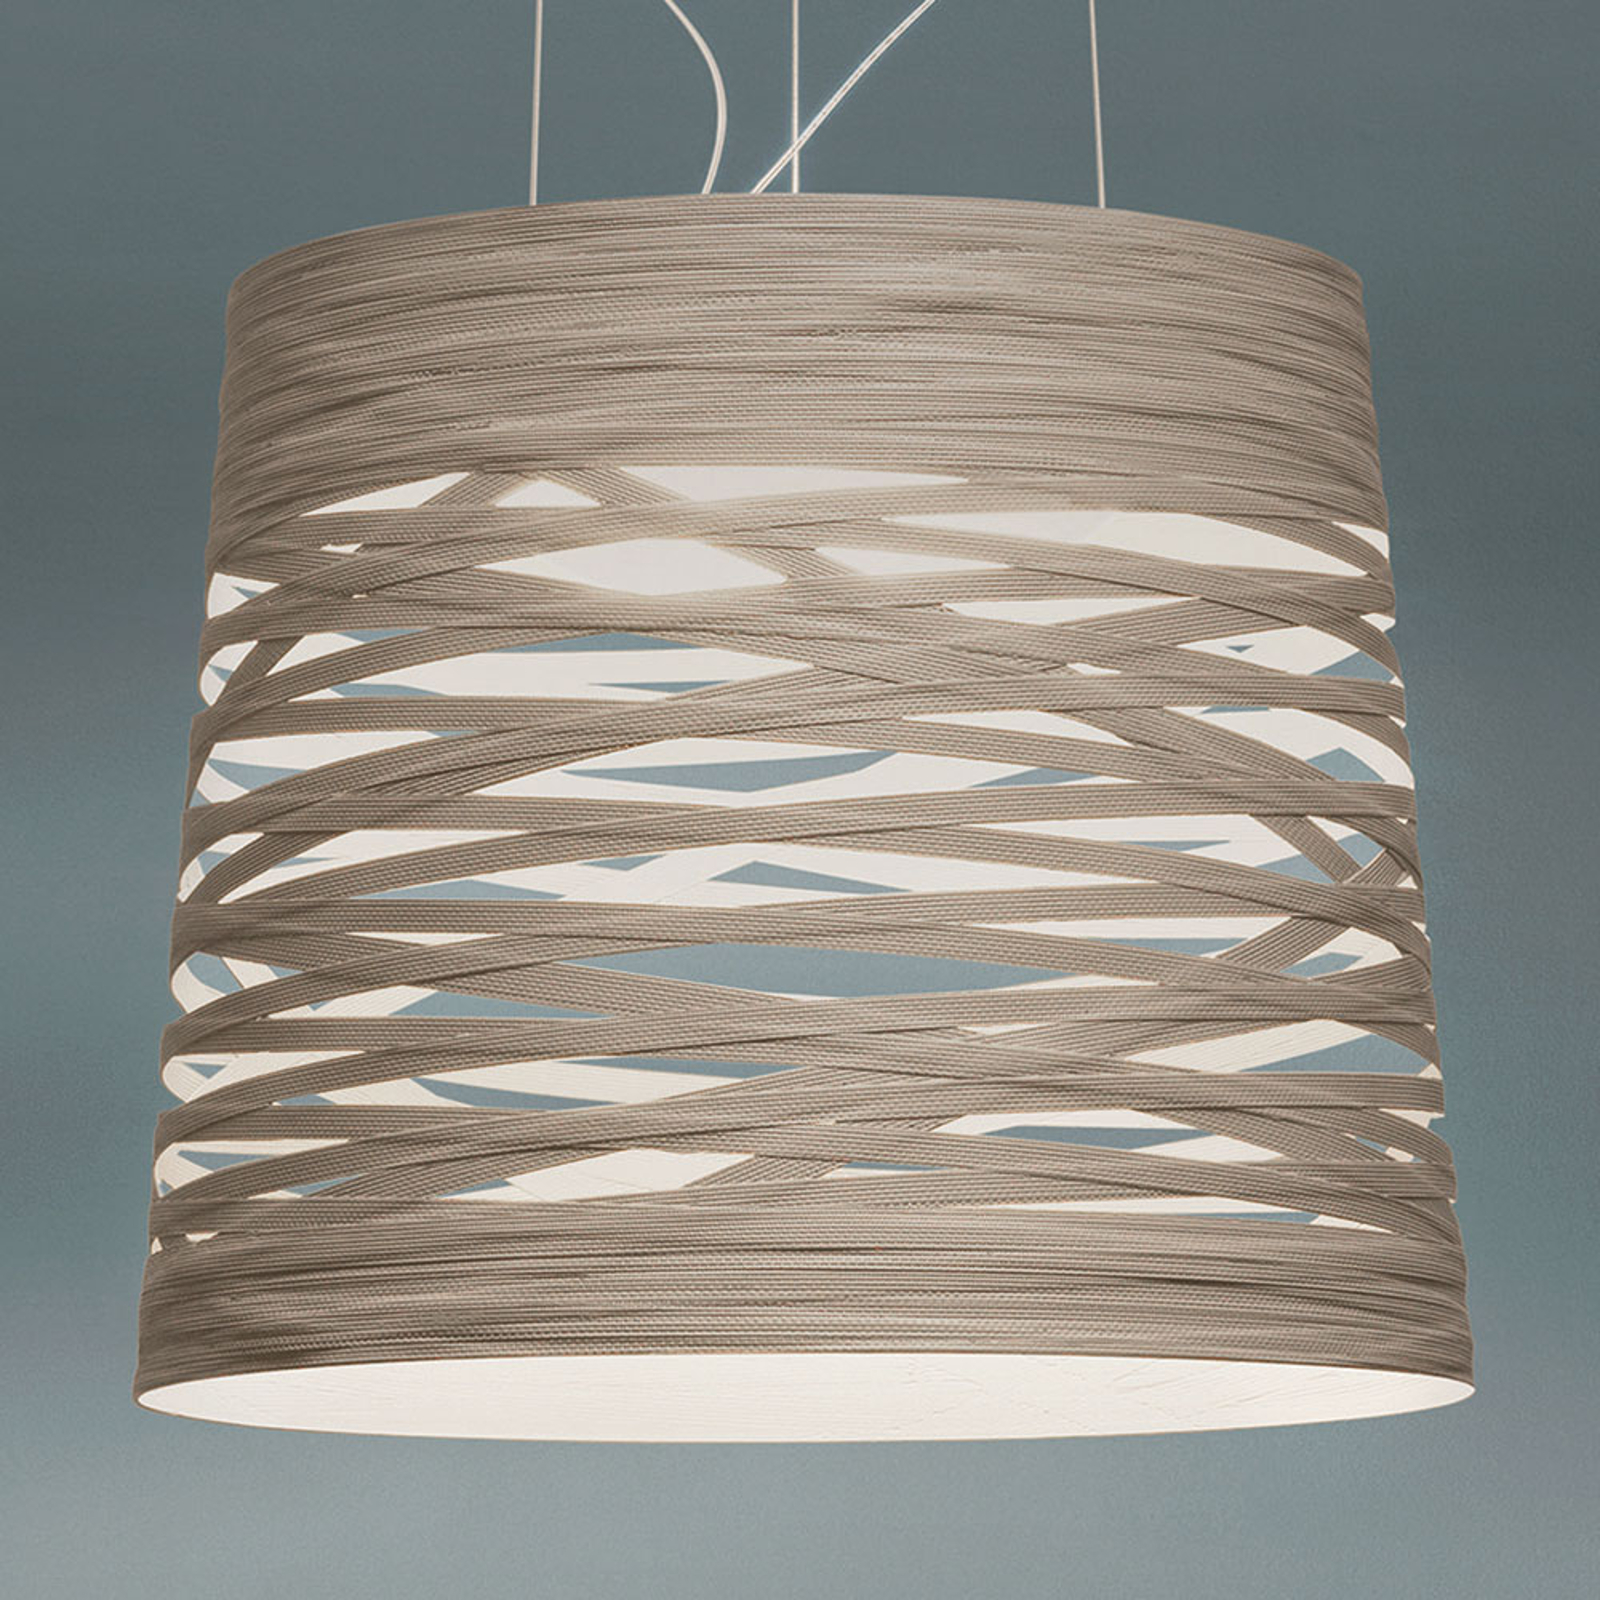 Foscarini Tress grande LED-Hängeleuchte, weiß